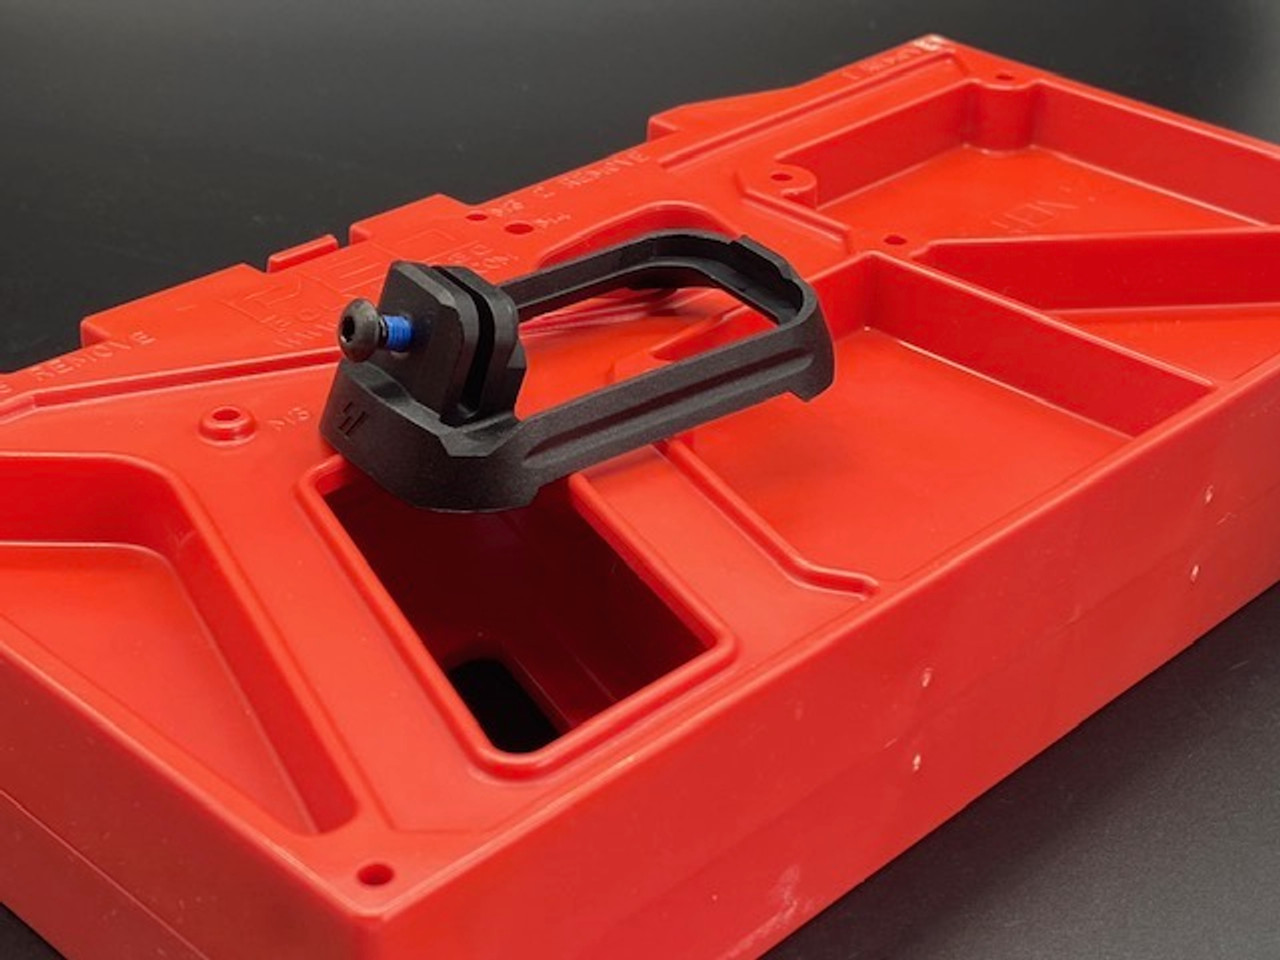 Strike Industries Polymer Magwell for P80 PF940Cv1 & PF940V2